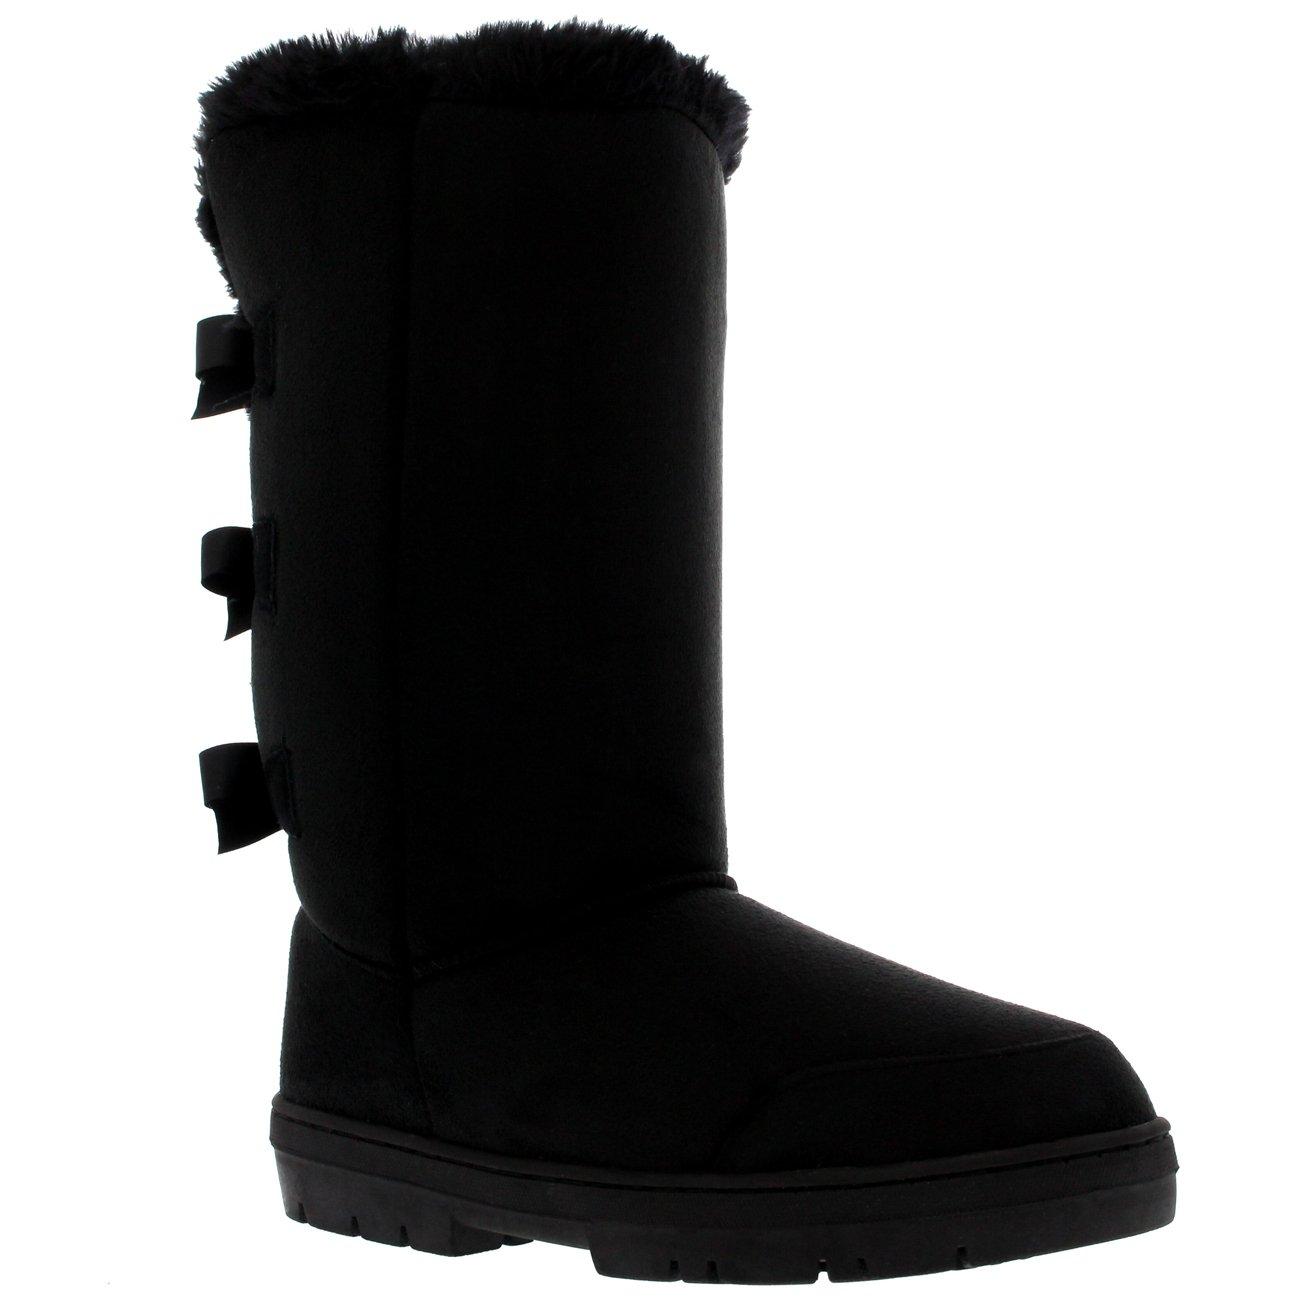 Holly Womens Triplet Bow Tall Classic Waterproof Winter Rain Snow Boots - Black - 9 - BLA40 AEA0230